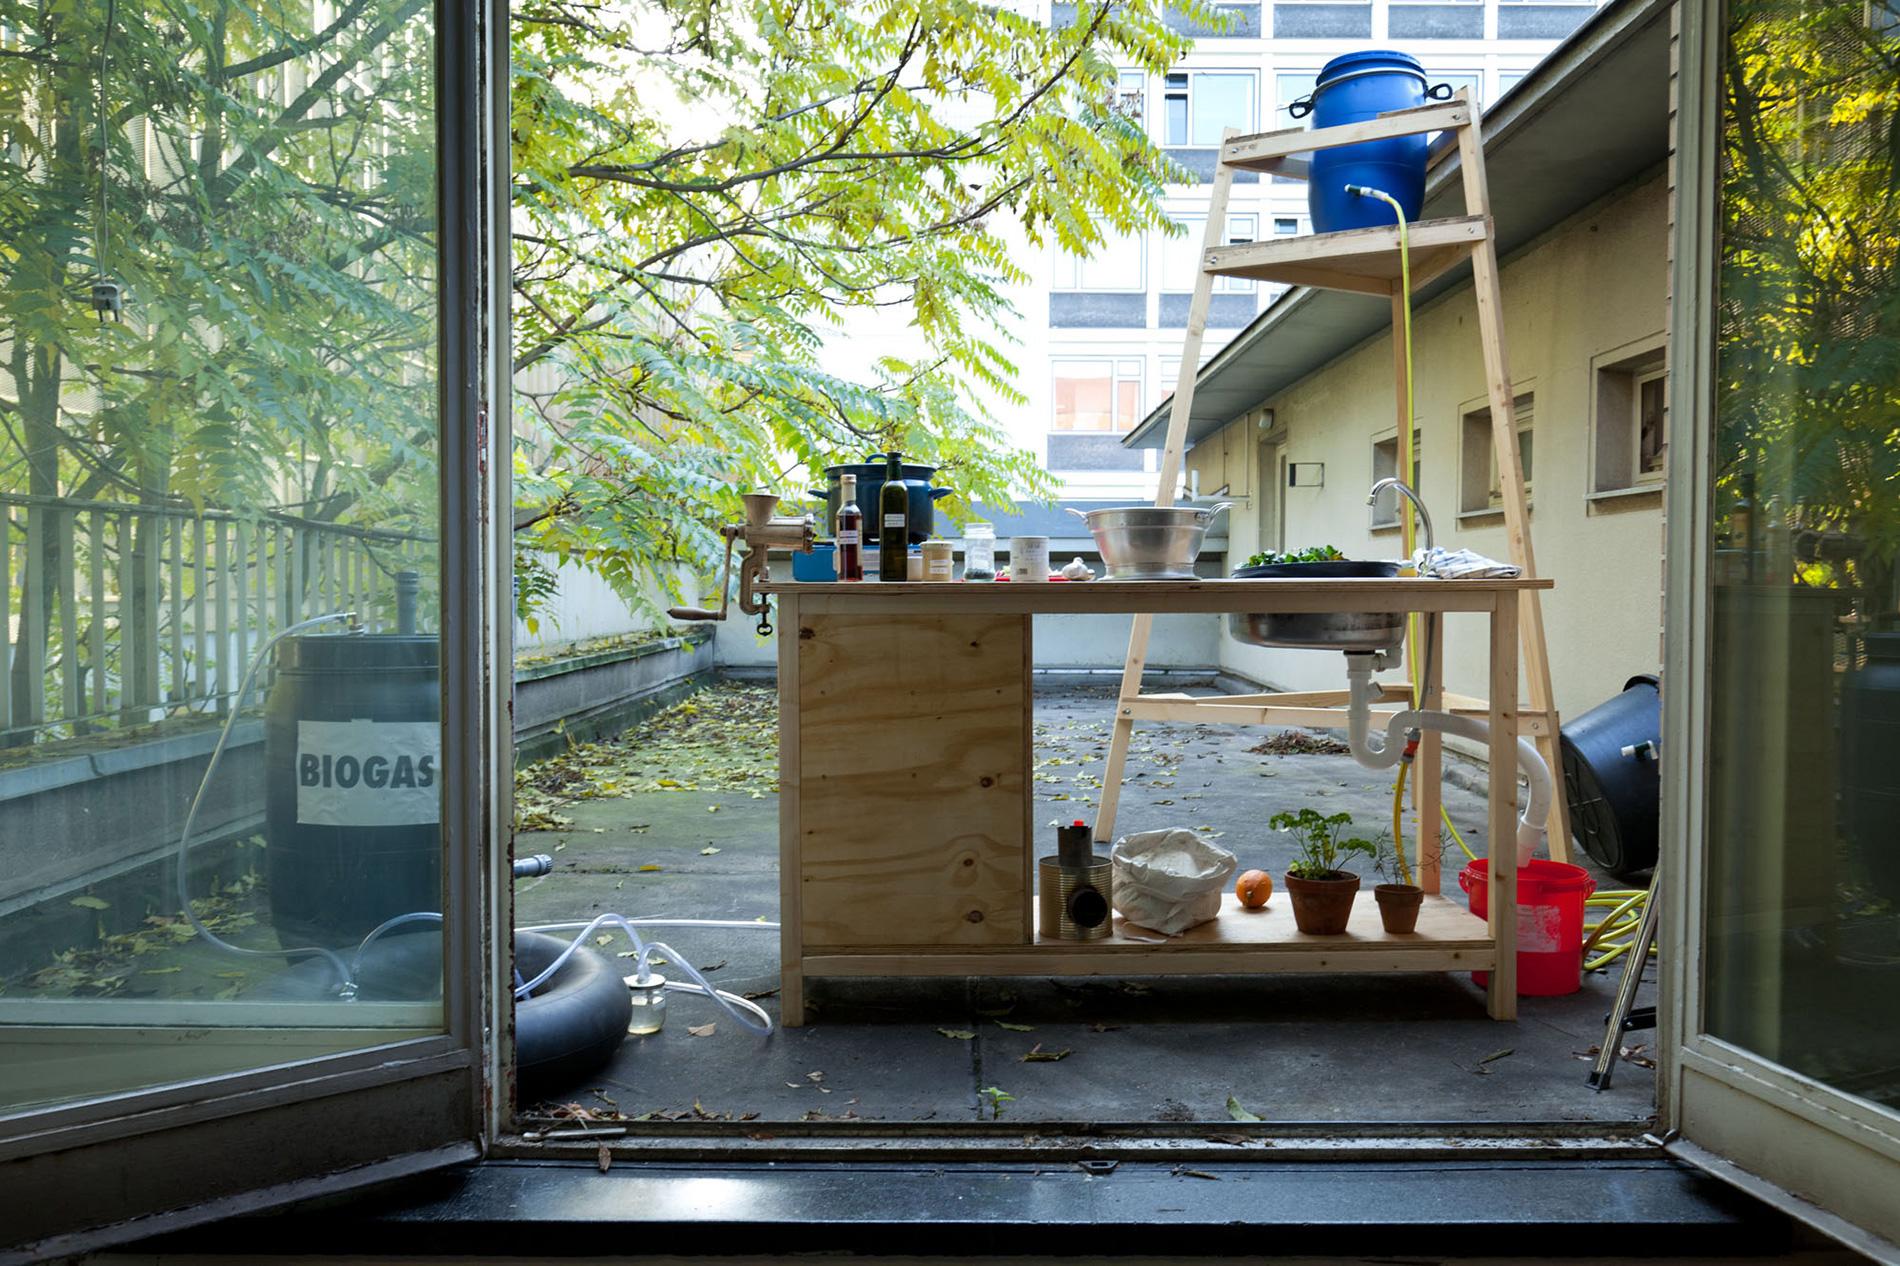 installation setup (photo: Sven Hagolani)